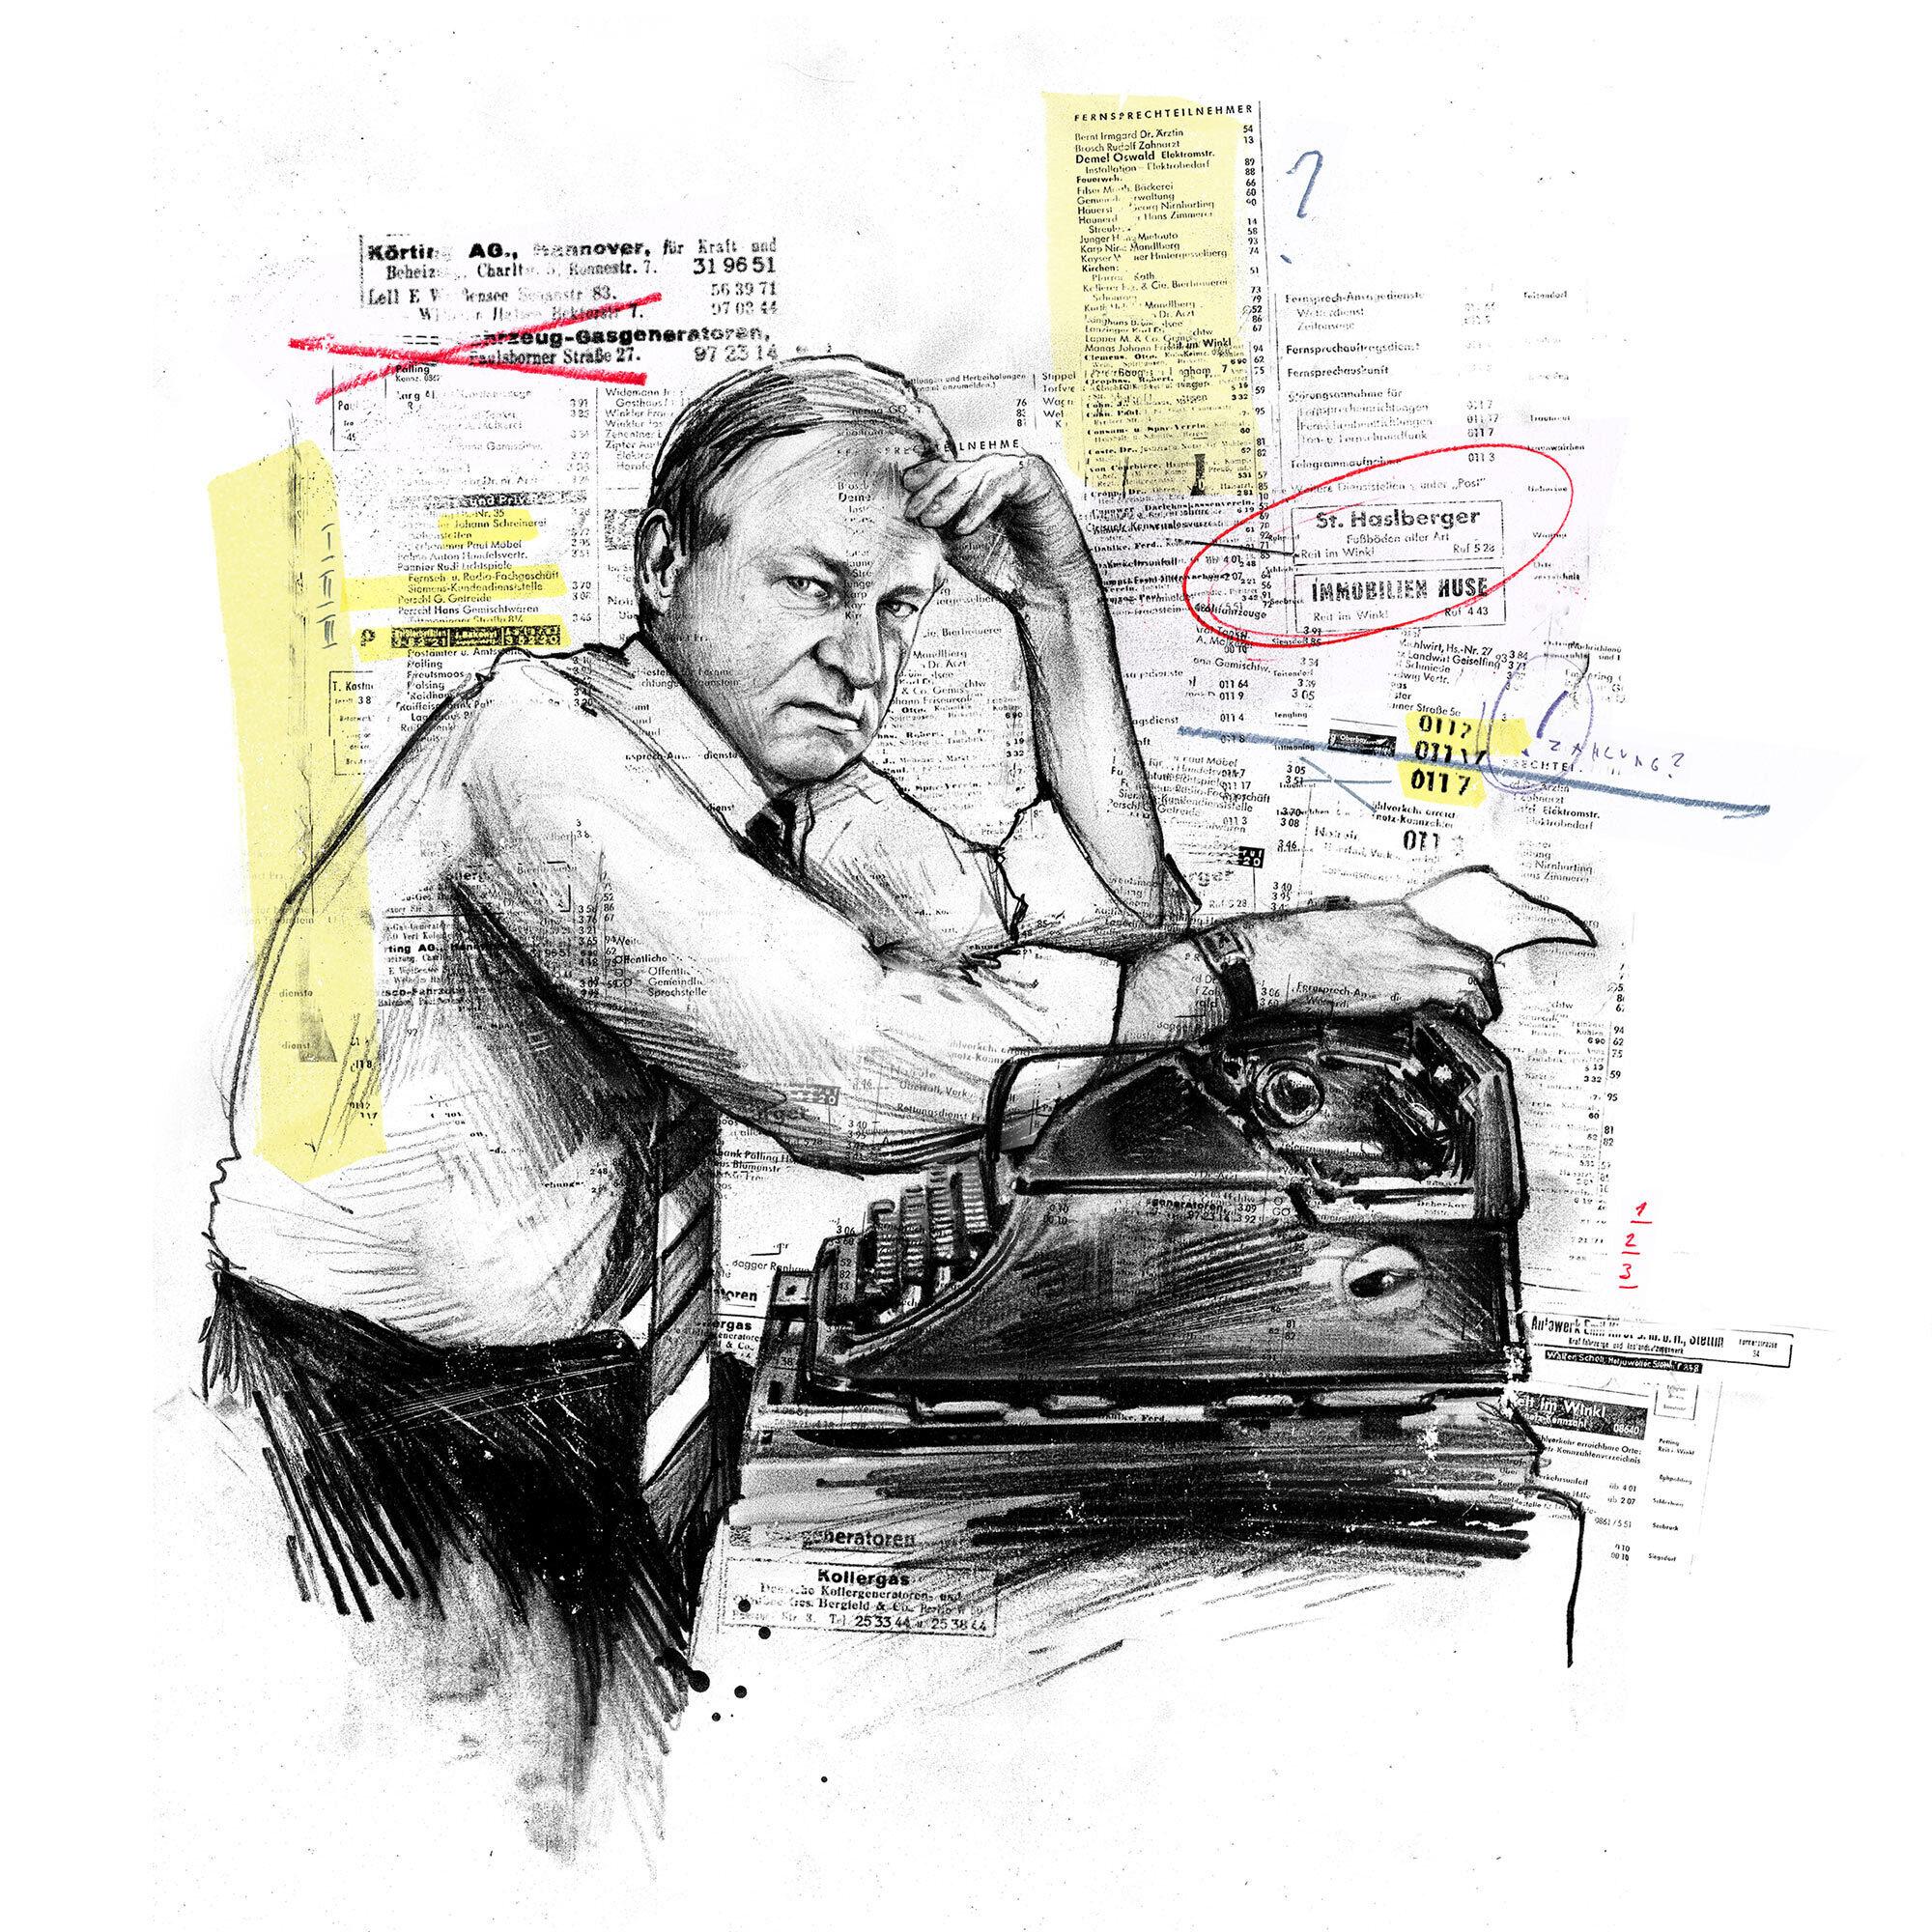 Ludwig A Minelli Telefonbuch Portrait Illustration WOZ - Kornel Illustration | Kornel Stadler portfolio